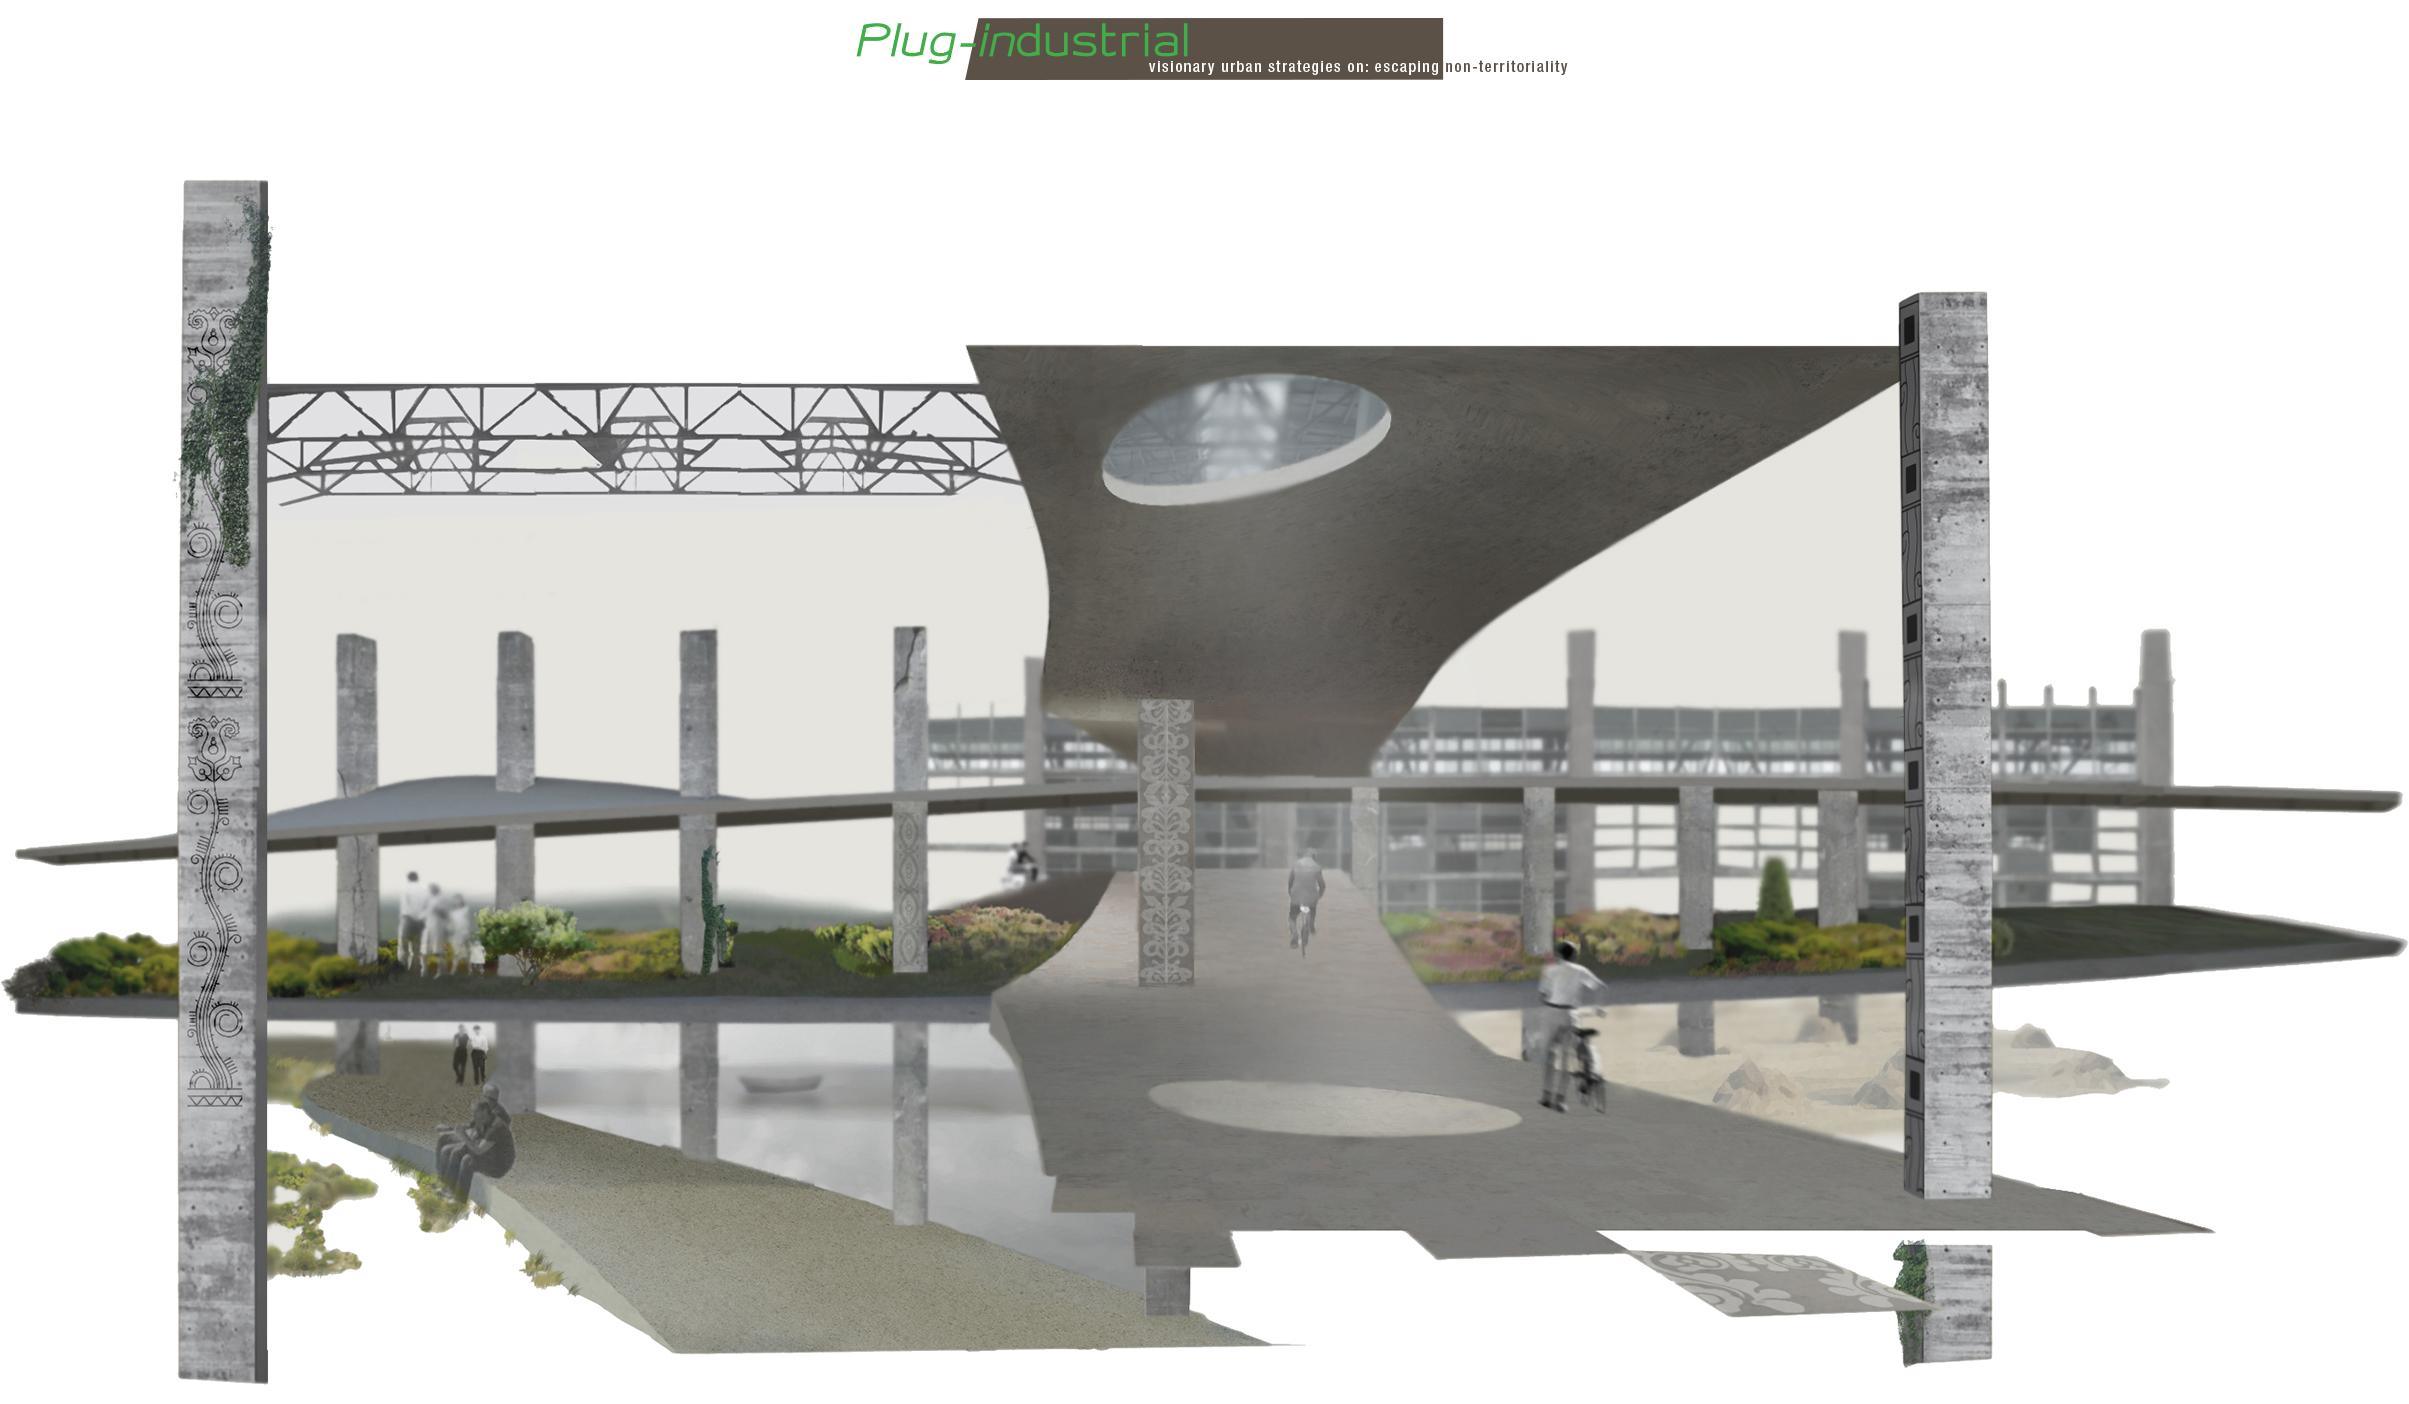 Plug-industrial :: Future Architecture Platform